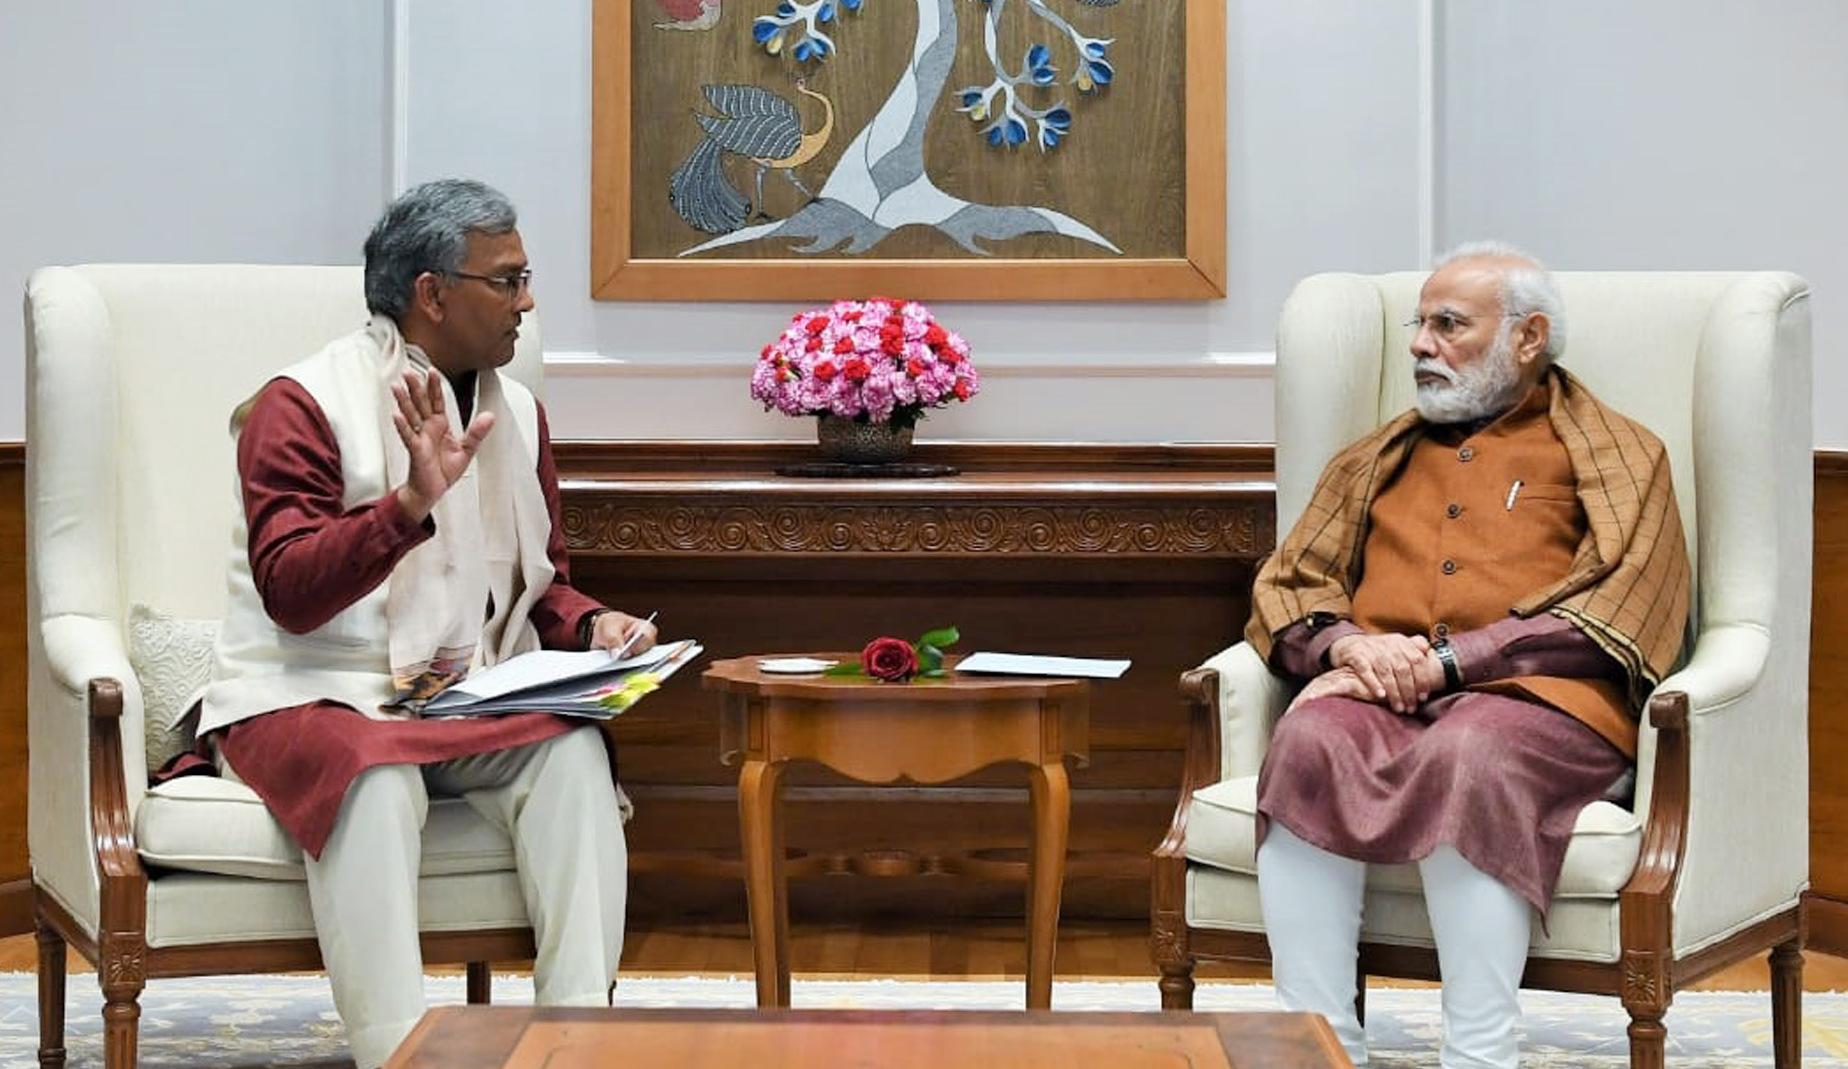 Uttarakhand, Dehradun, New Delhi, Trivendra Singh Rawat, Narendra Modi, BJP